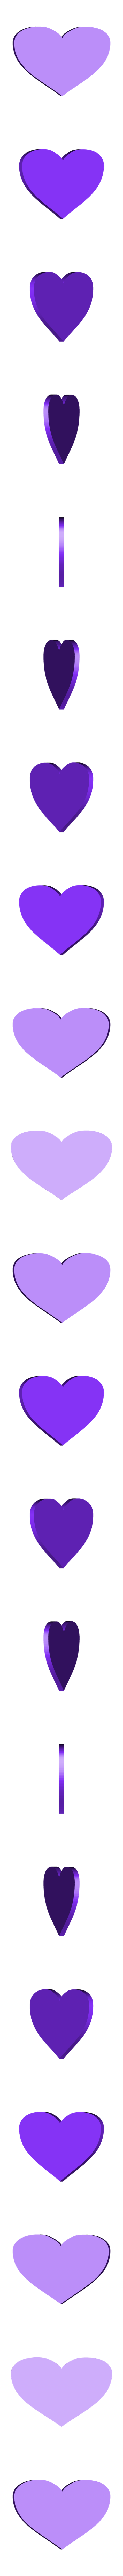 coeur plein petit.stl Download STL file panda hearts decoration • 3D printer template, catf3d